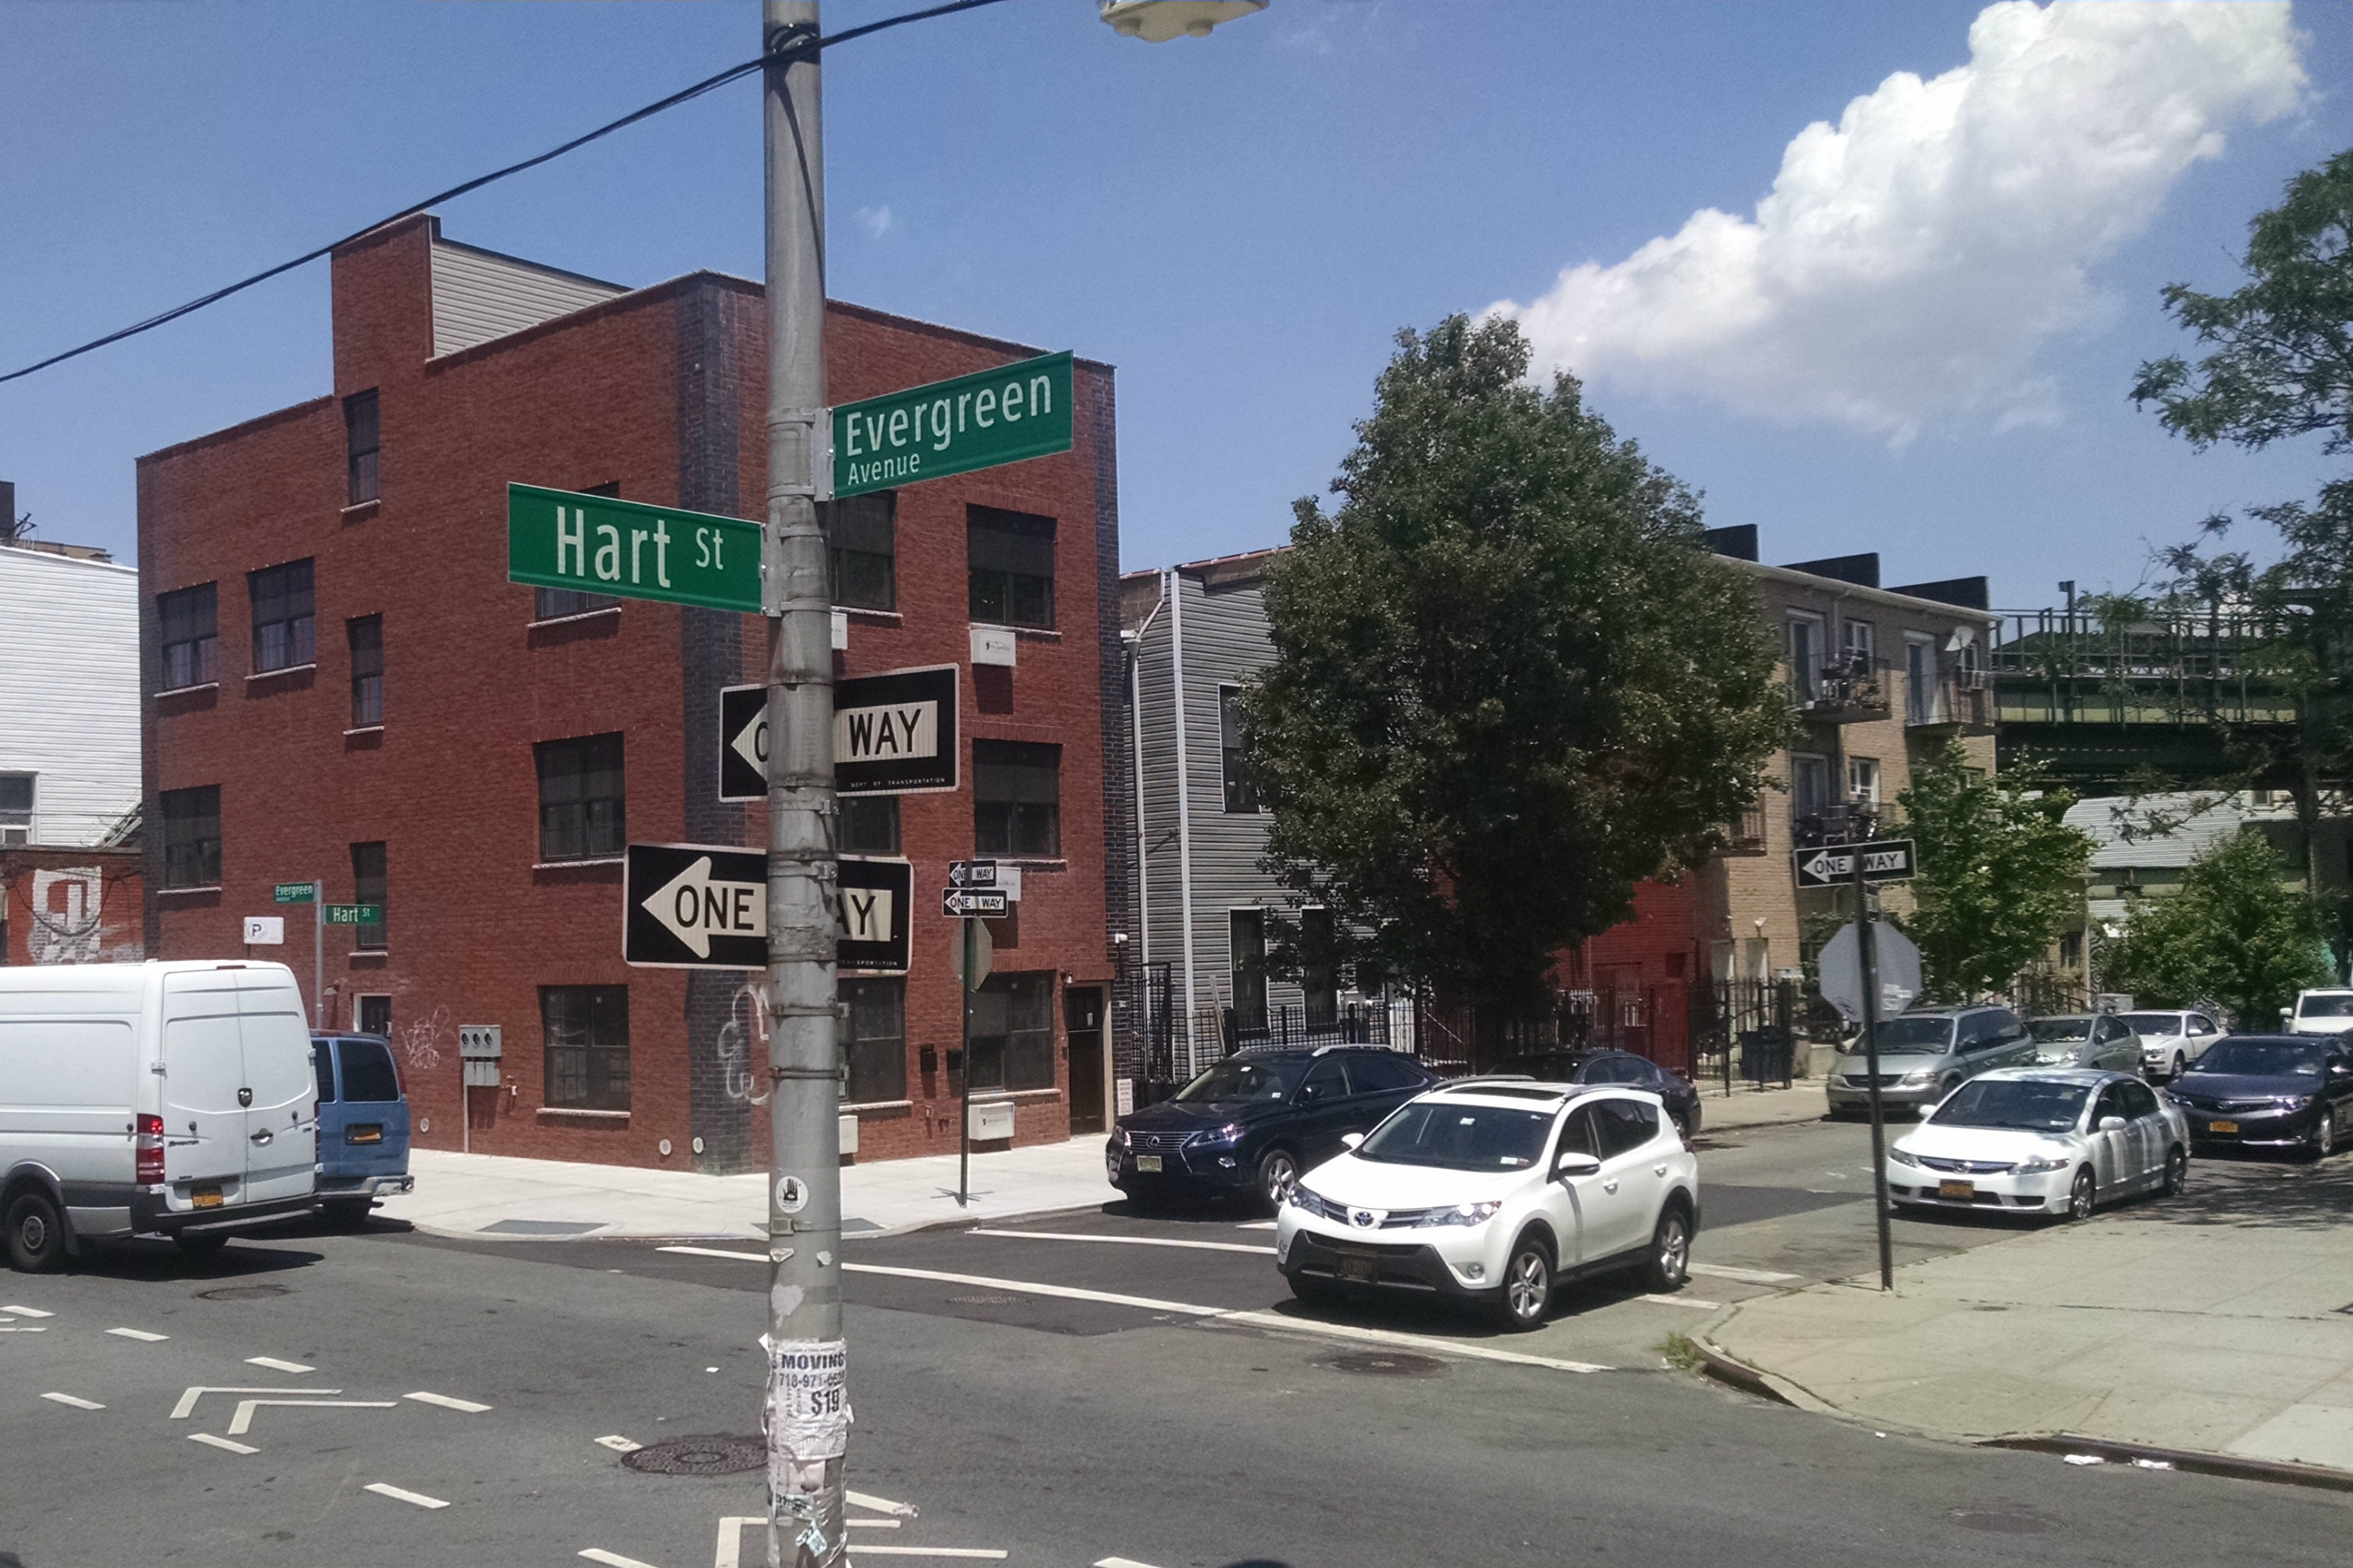 Evergreen Avenue